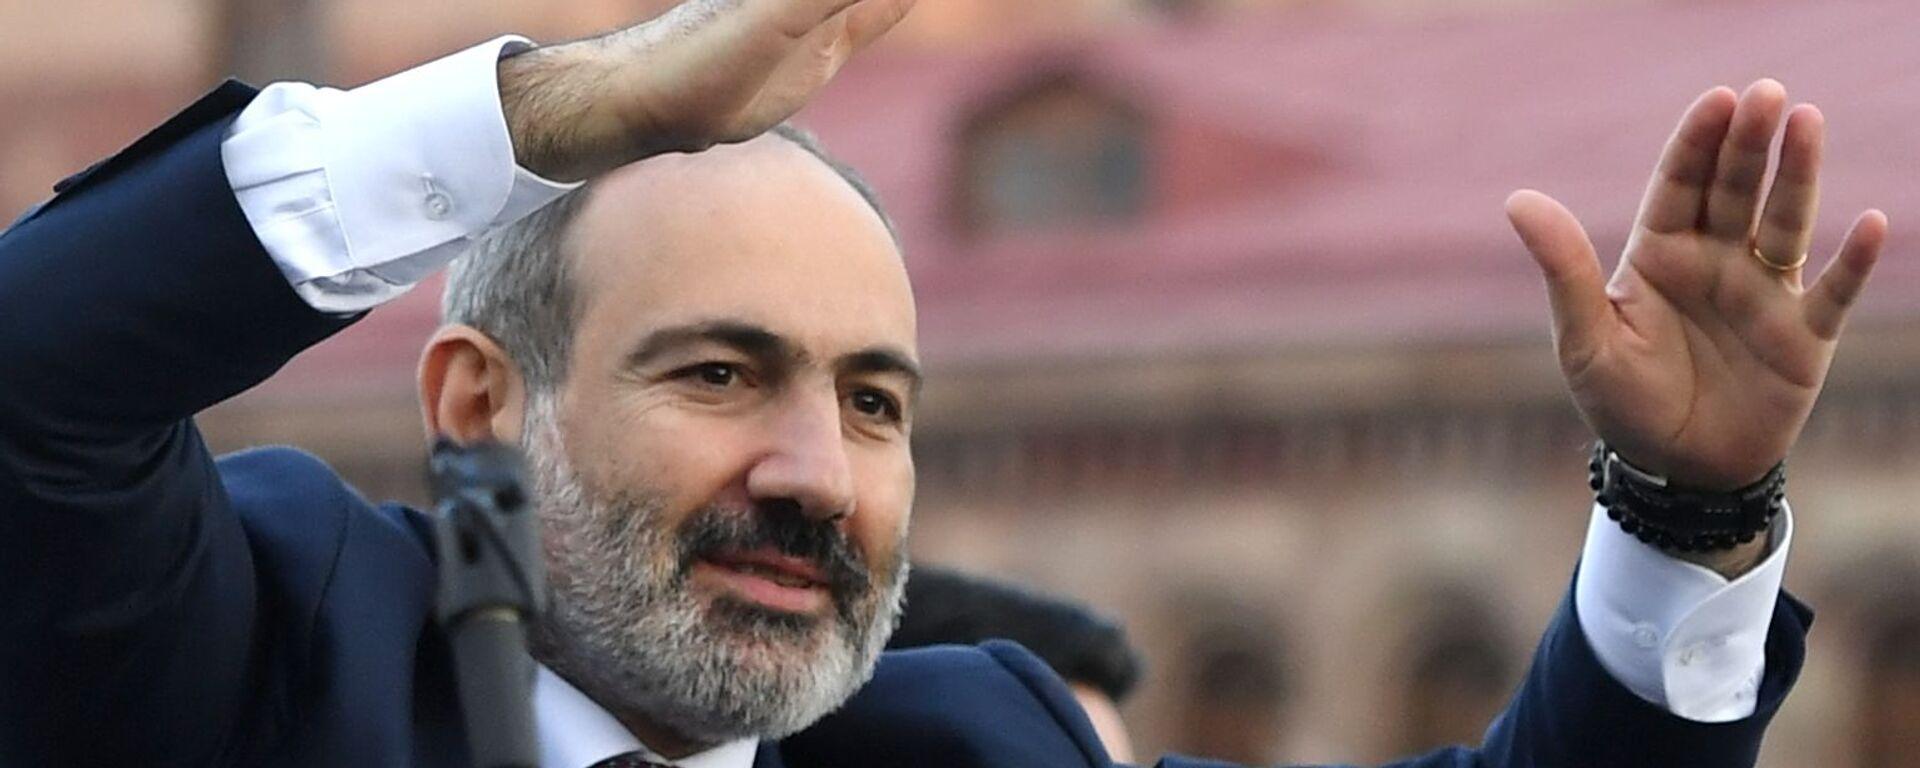 Il primo ministro Nikol Pashinyan - Sputnik Italia, 1920, 21.06.2021